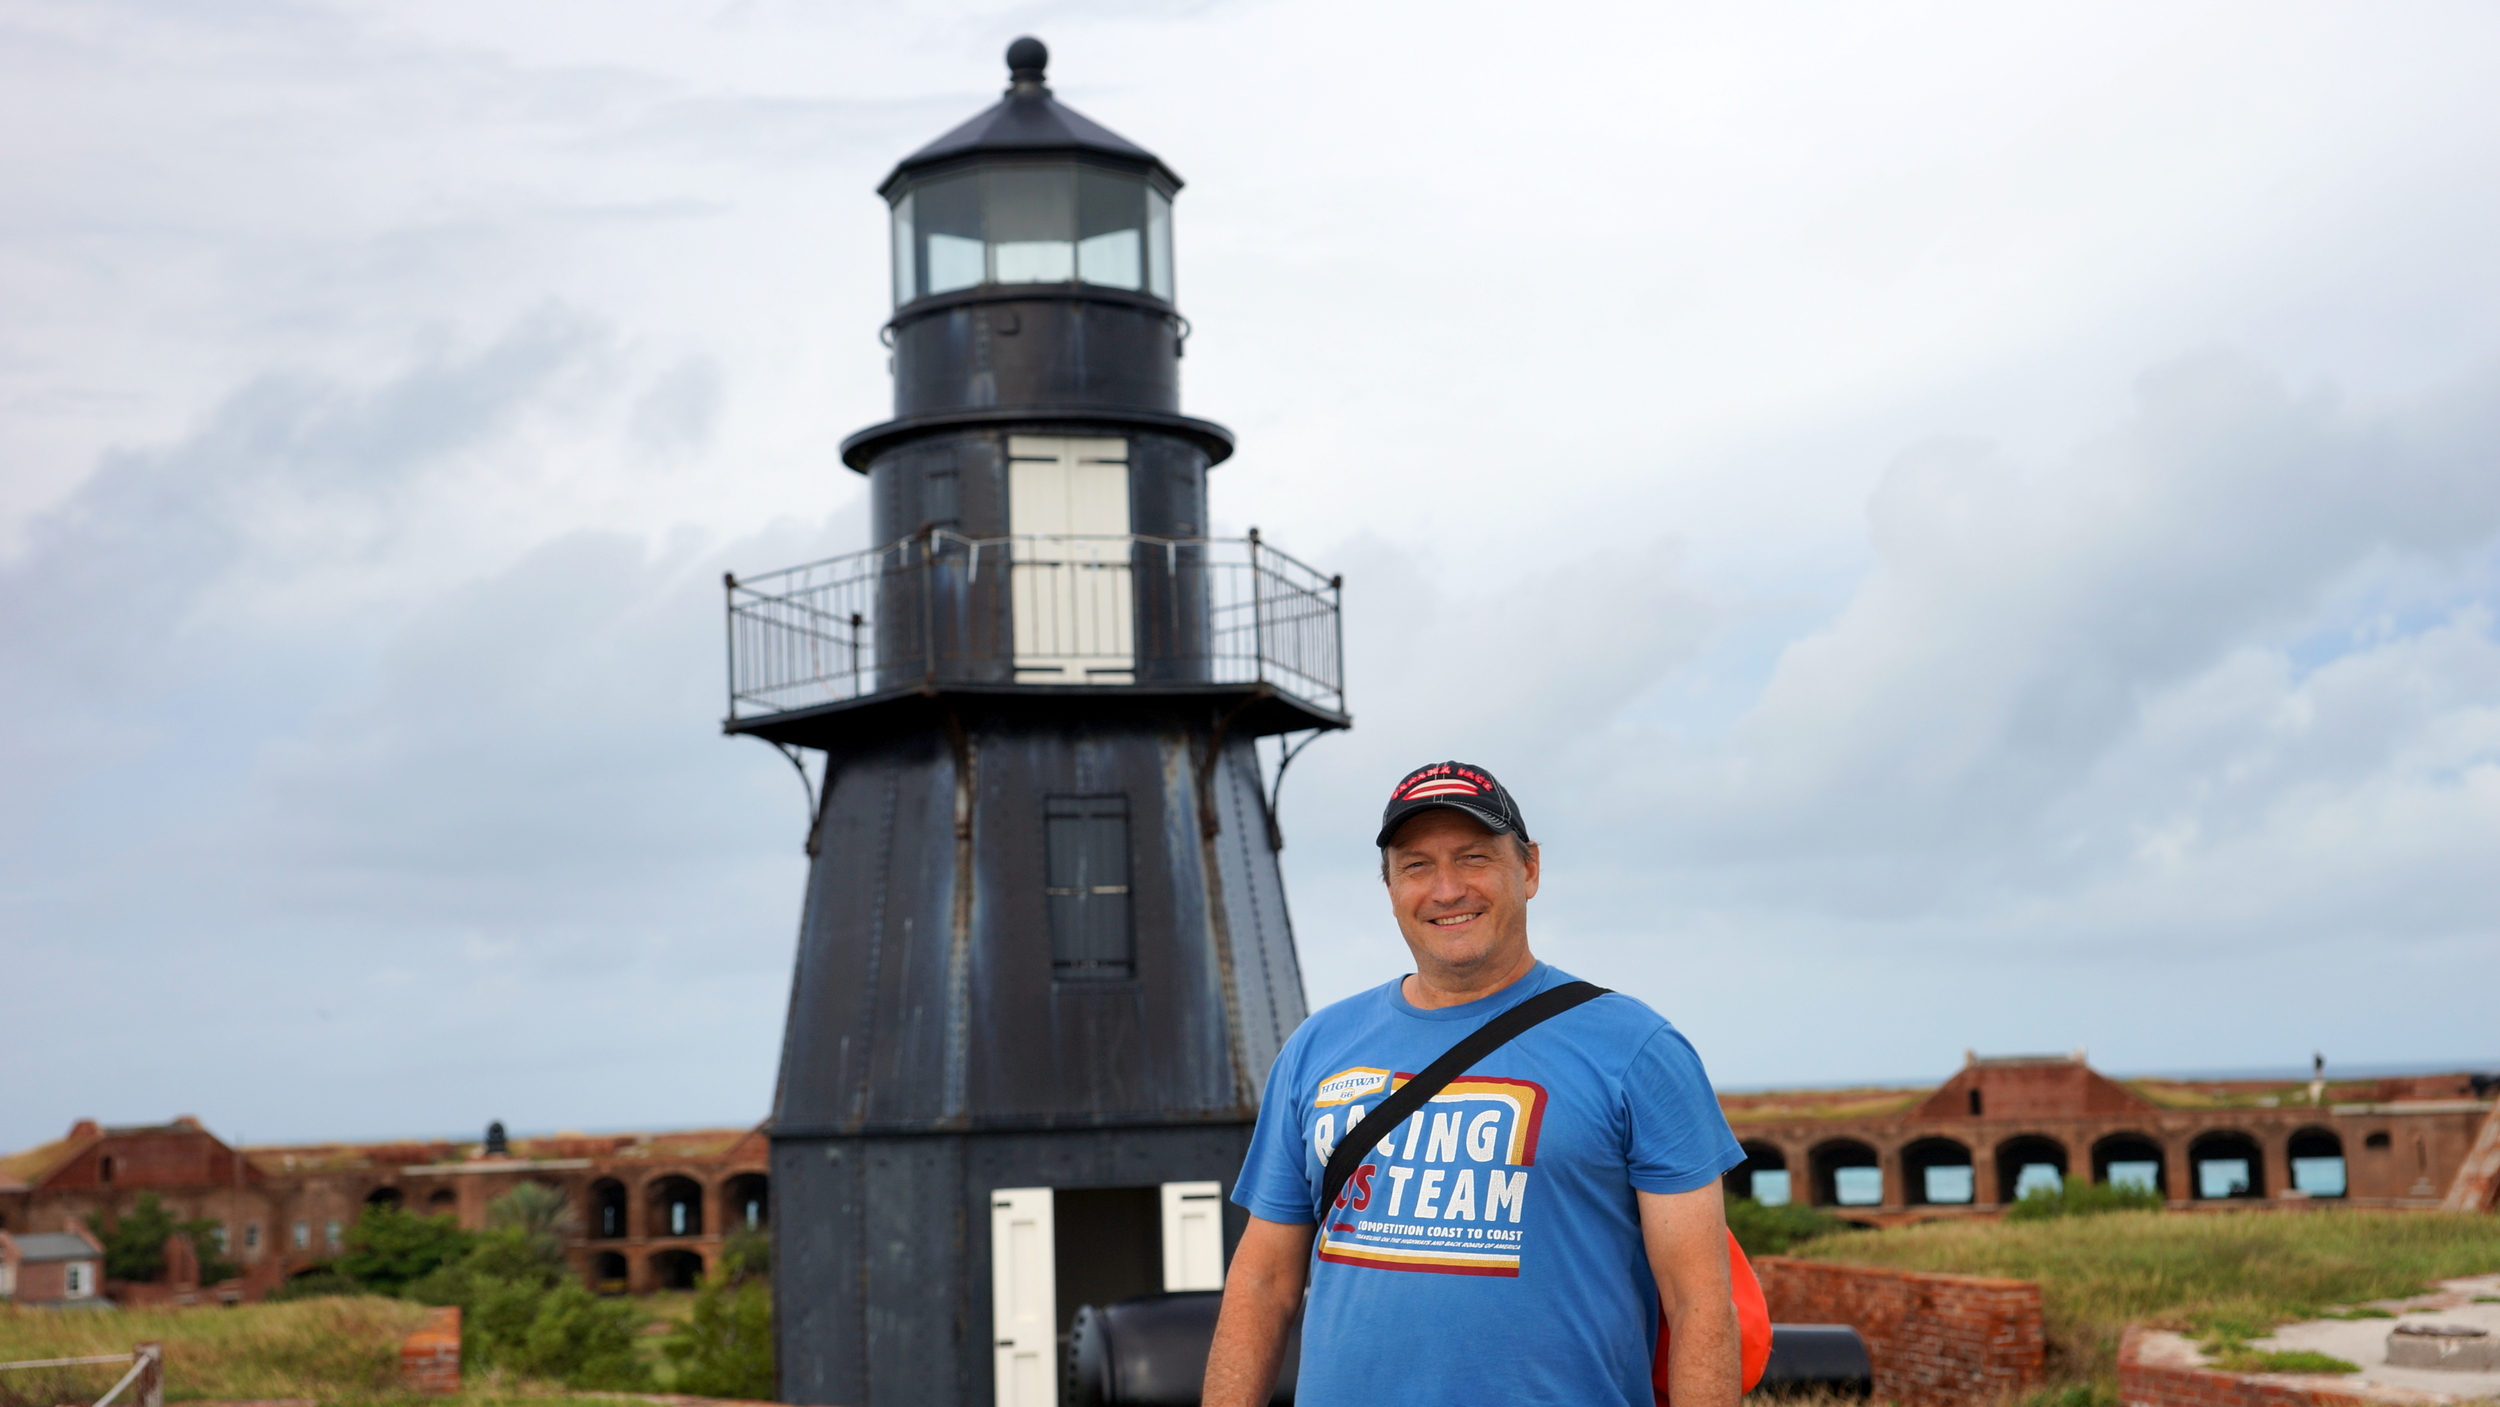 SC_FtJeff_Lighthouse.JPG